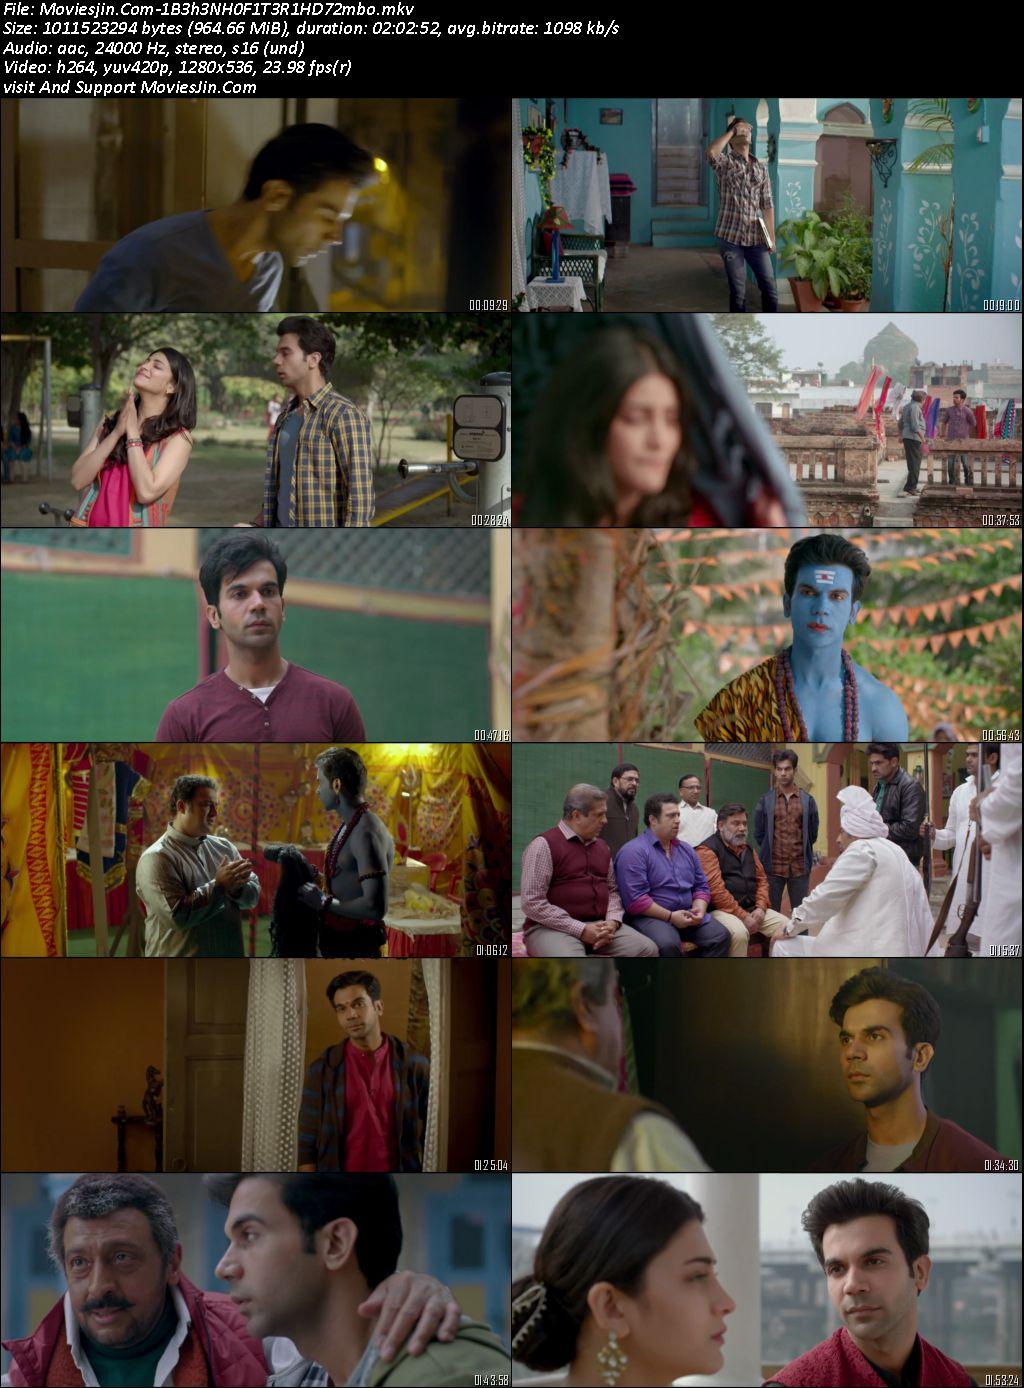 Watch Behen Hogi Teri 2017 Full HD Movie 720p x264 900MB Full Movie Download Khatrimaza, free download 9xmovies,